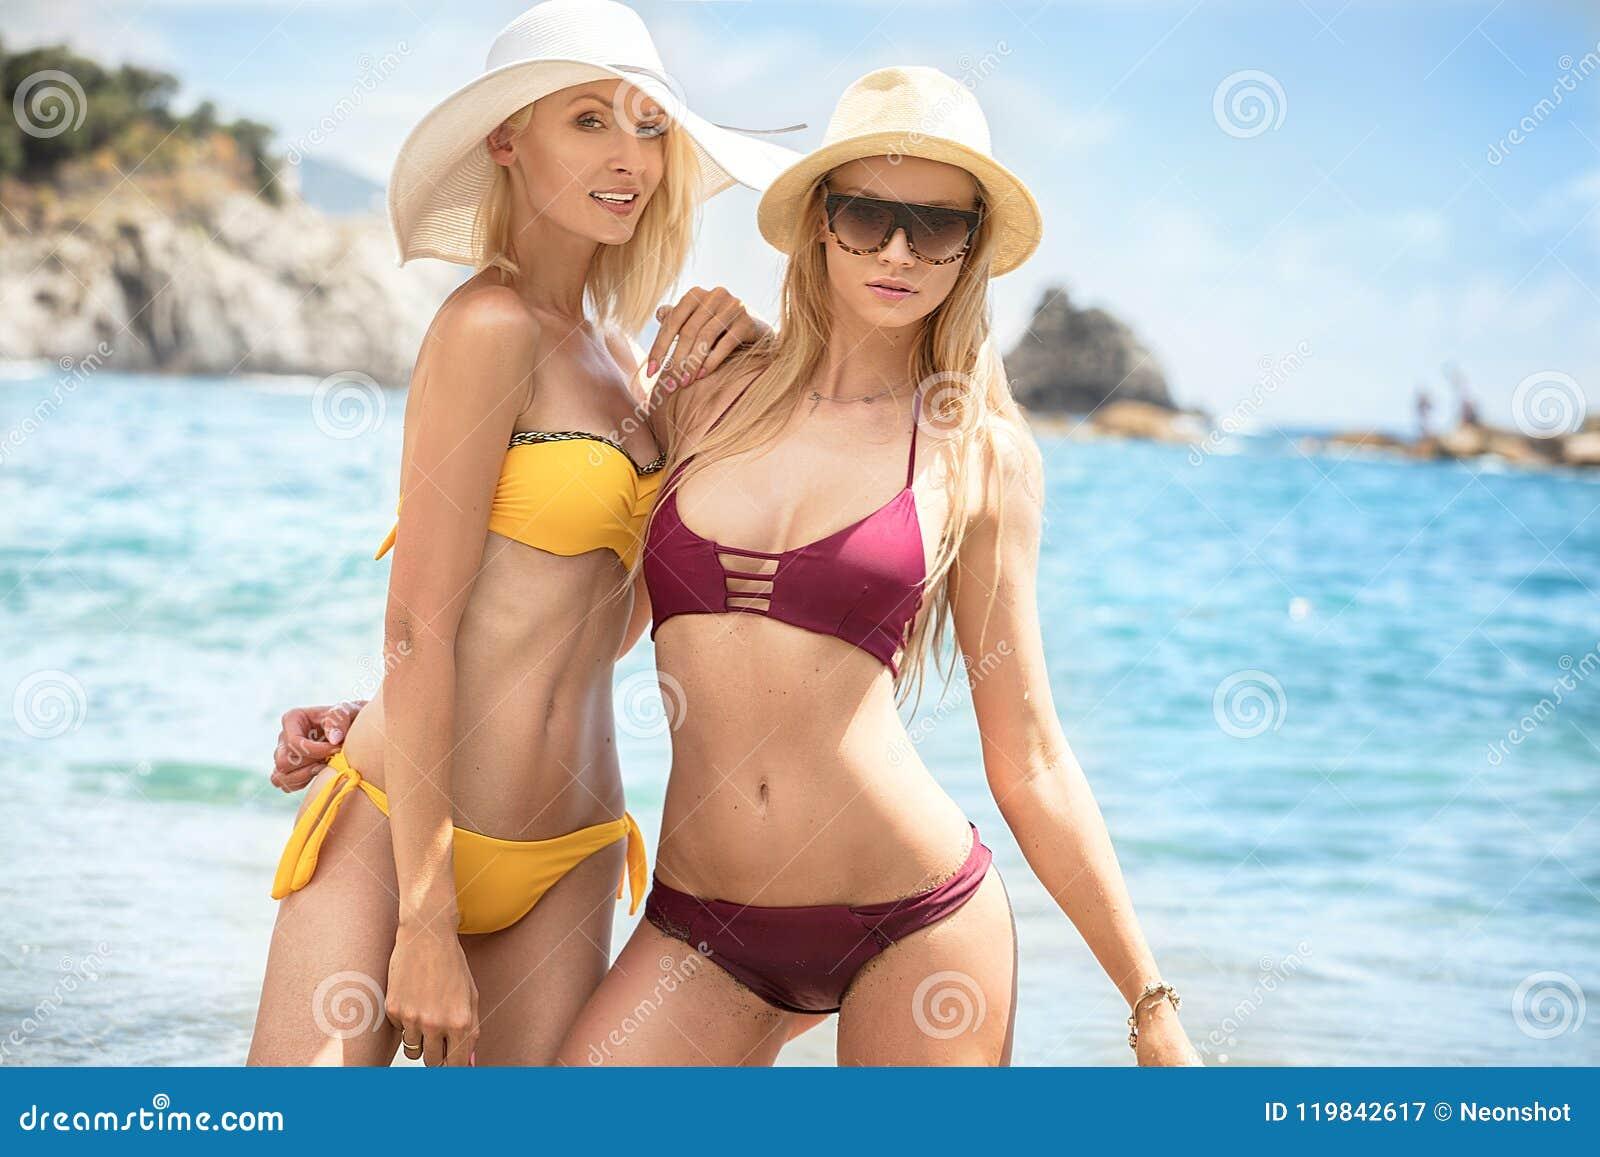 low rise bikini french